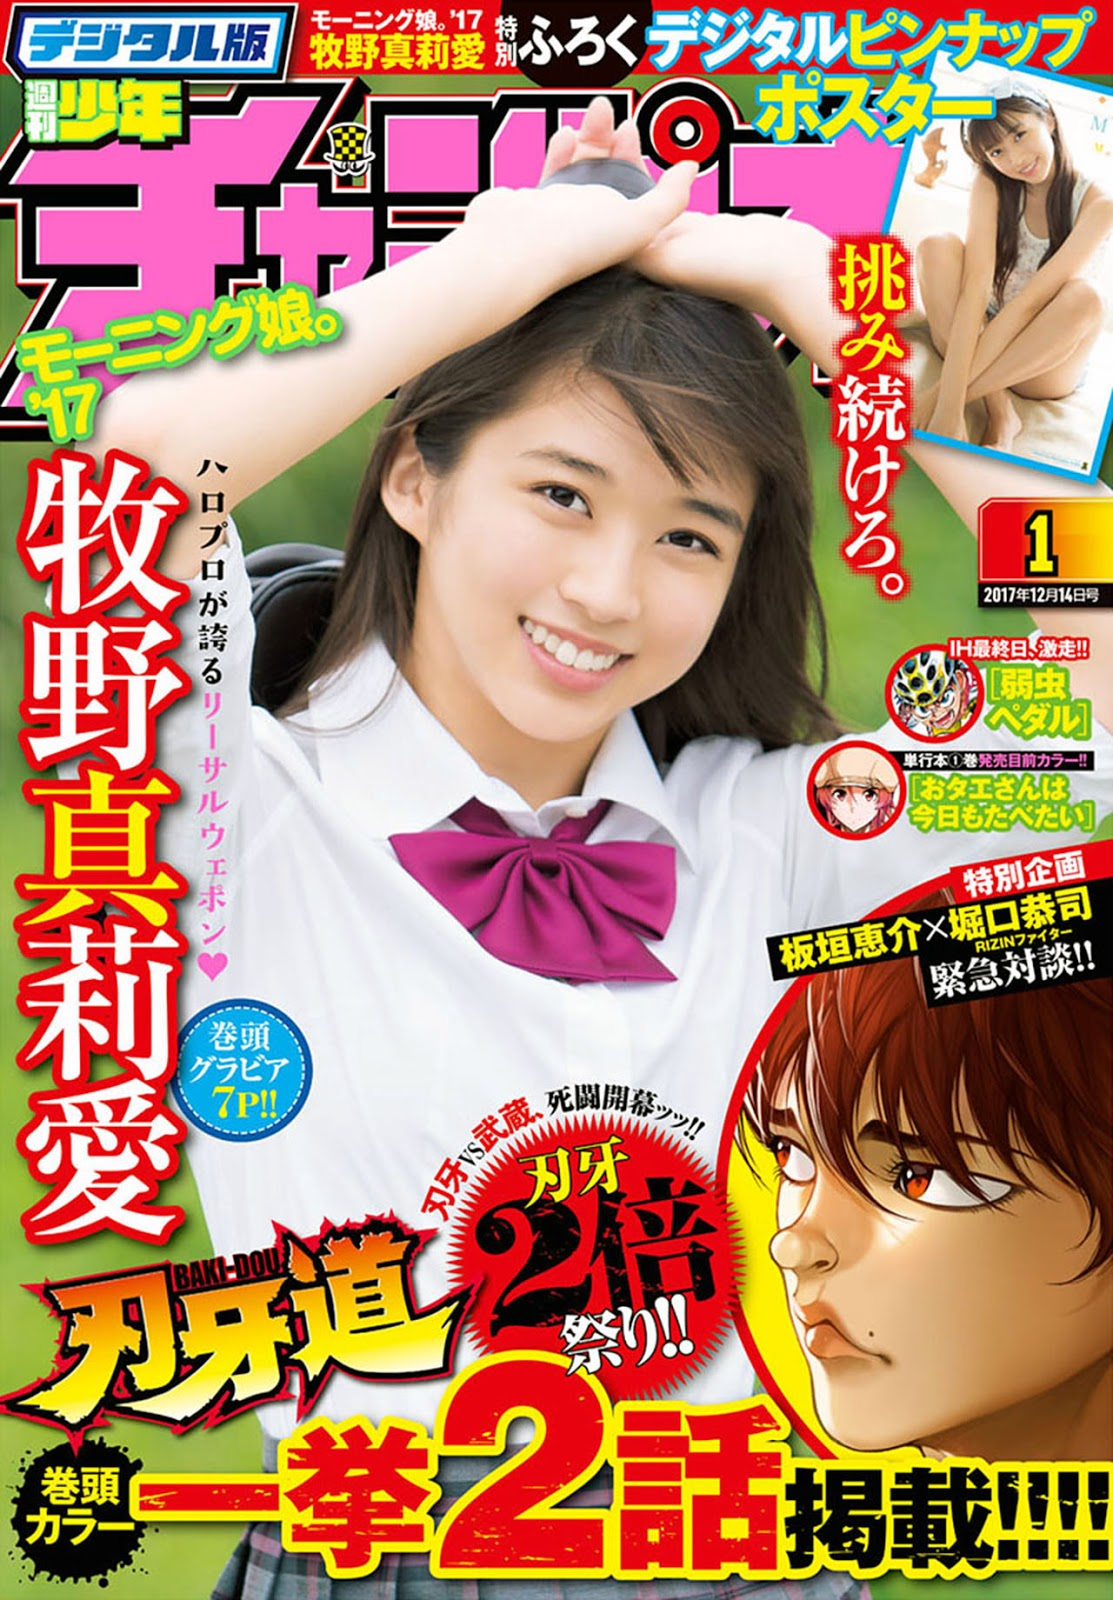 Makino Maria 牧野真莉愛, Shonen Champion 2018 No.01 (週刊少年チャンピオン 2018年01号)